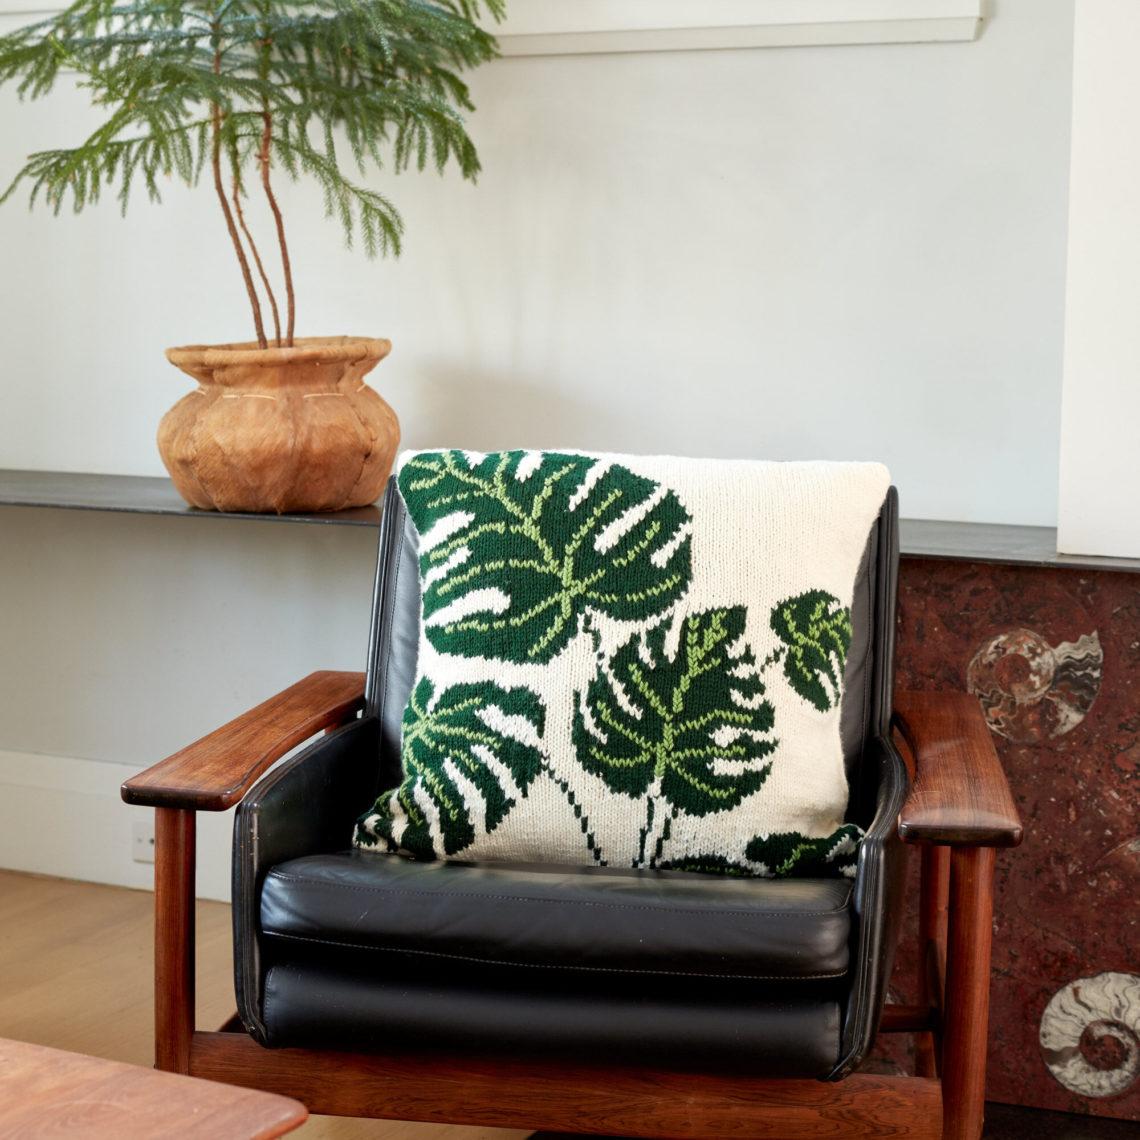 чехол для подушки спицами с узором листья